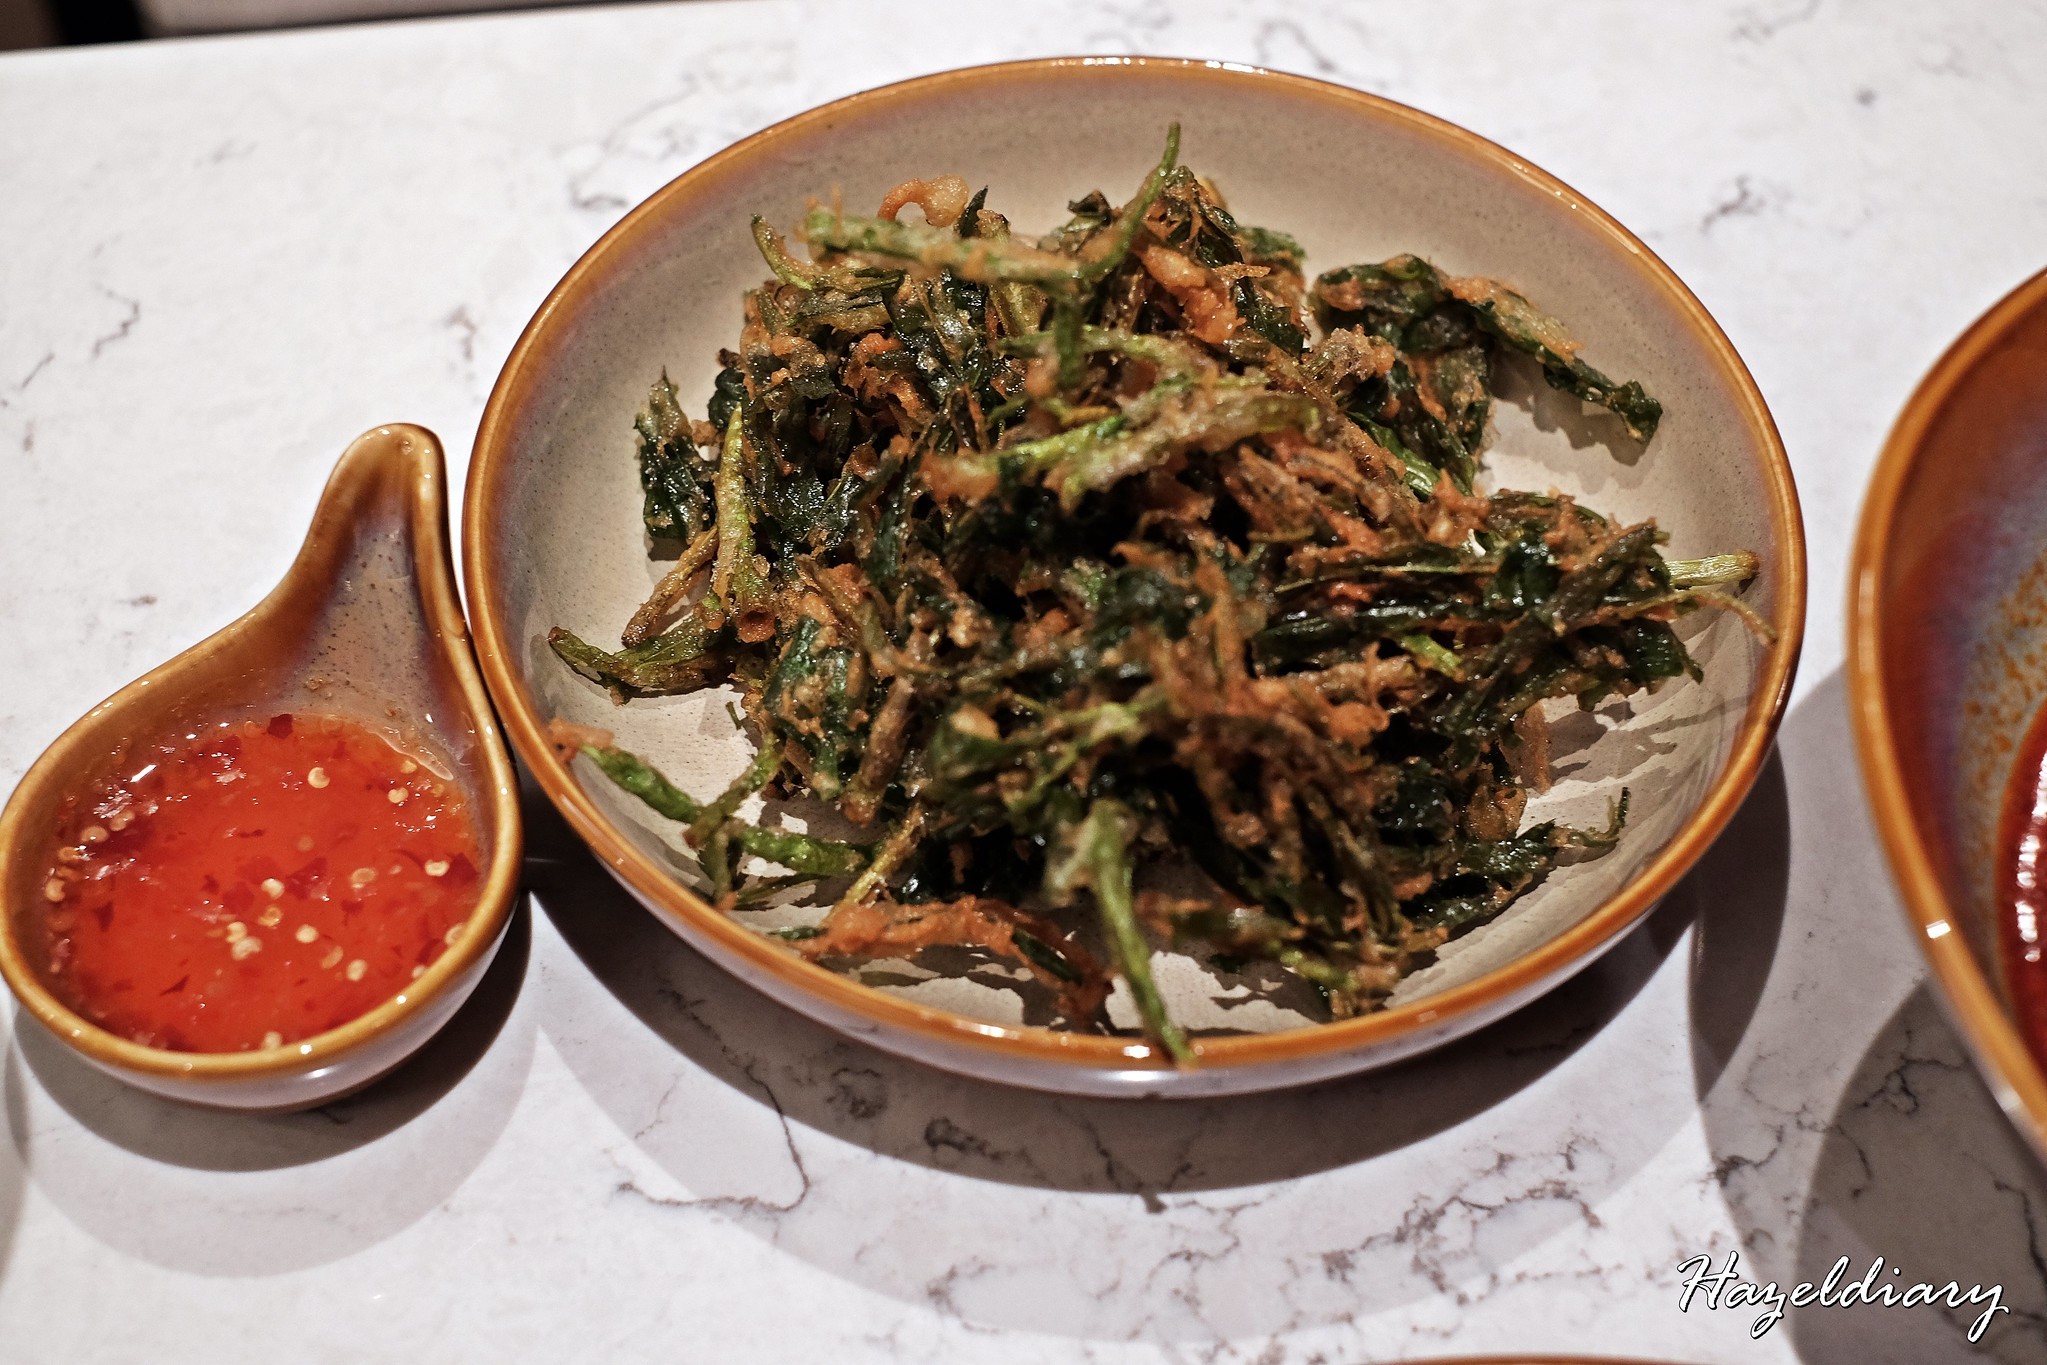 Chalerm Thai Restaurant-Kale